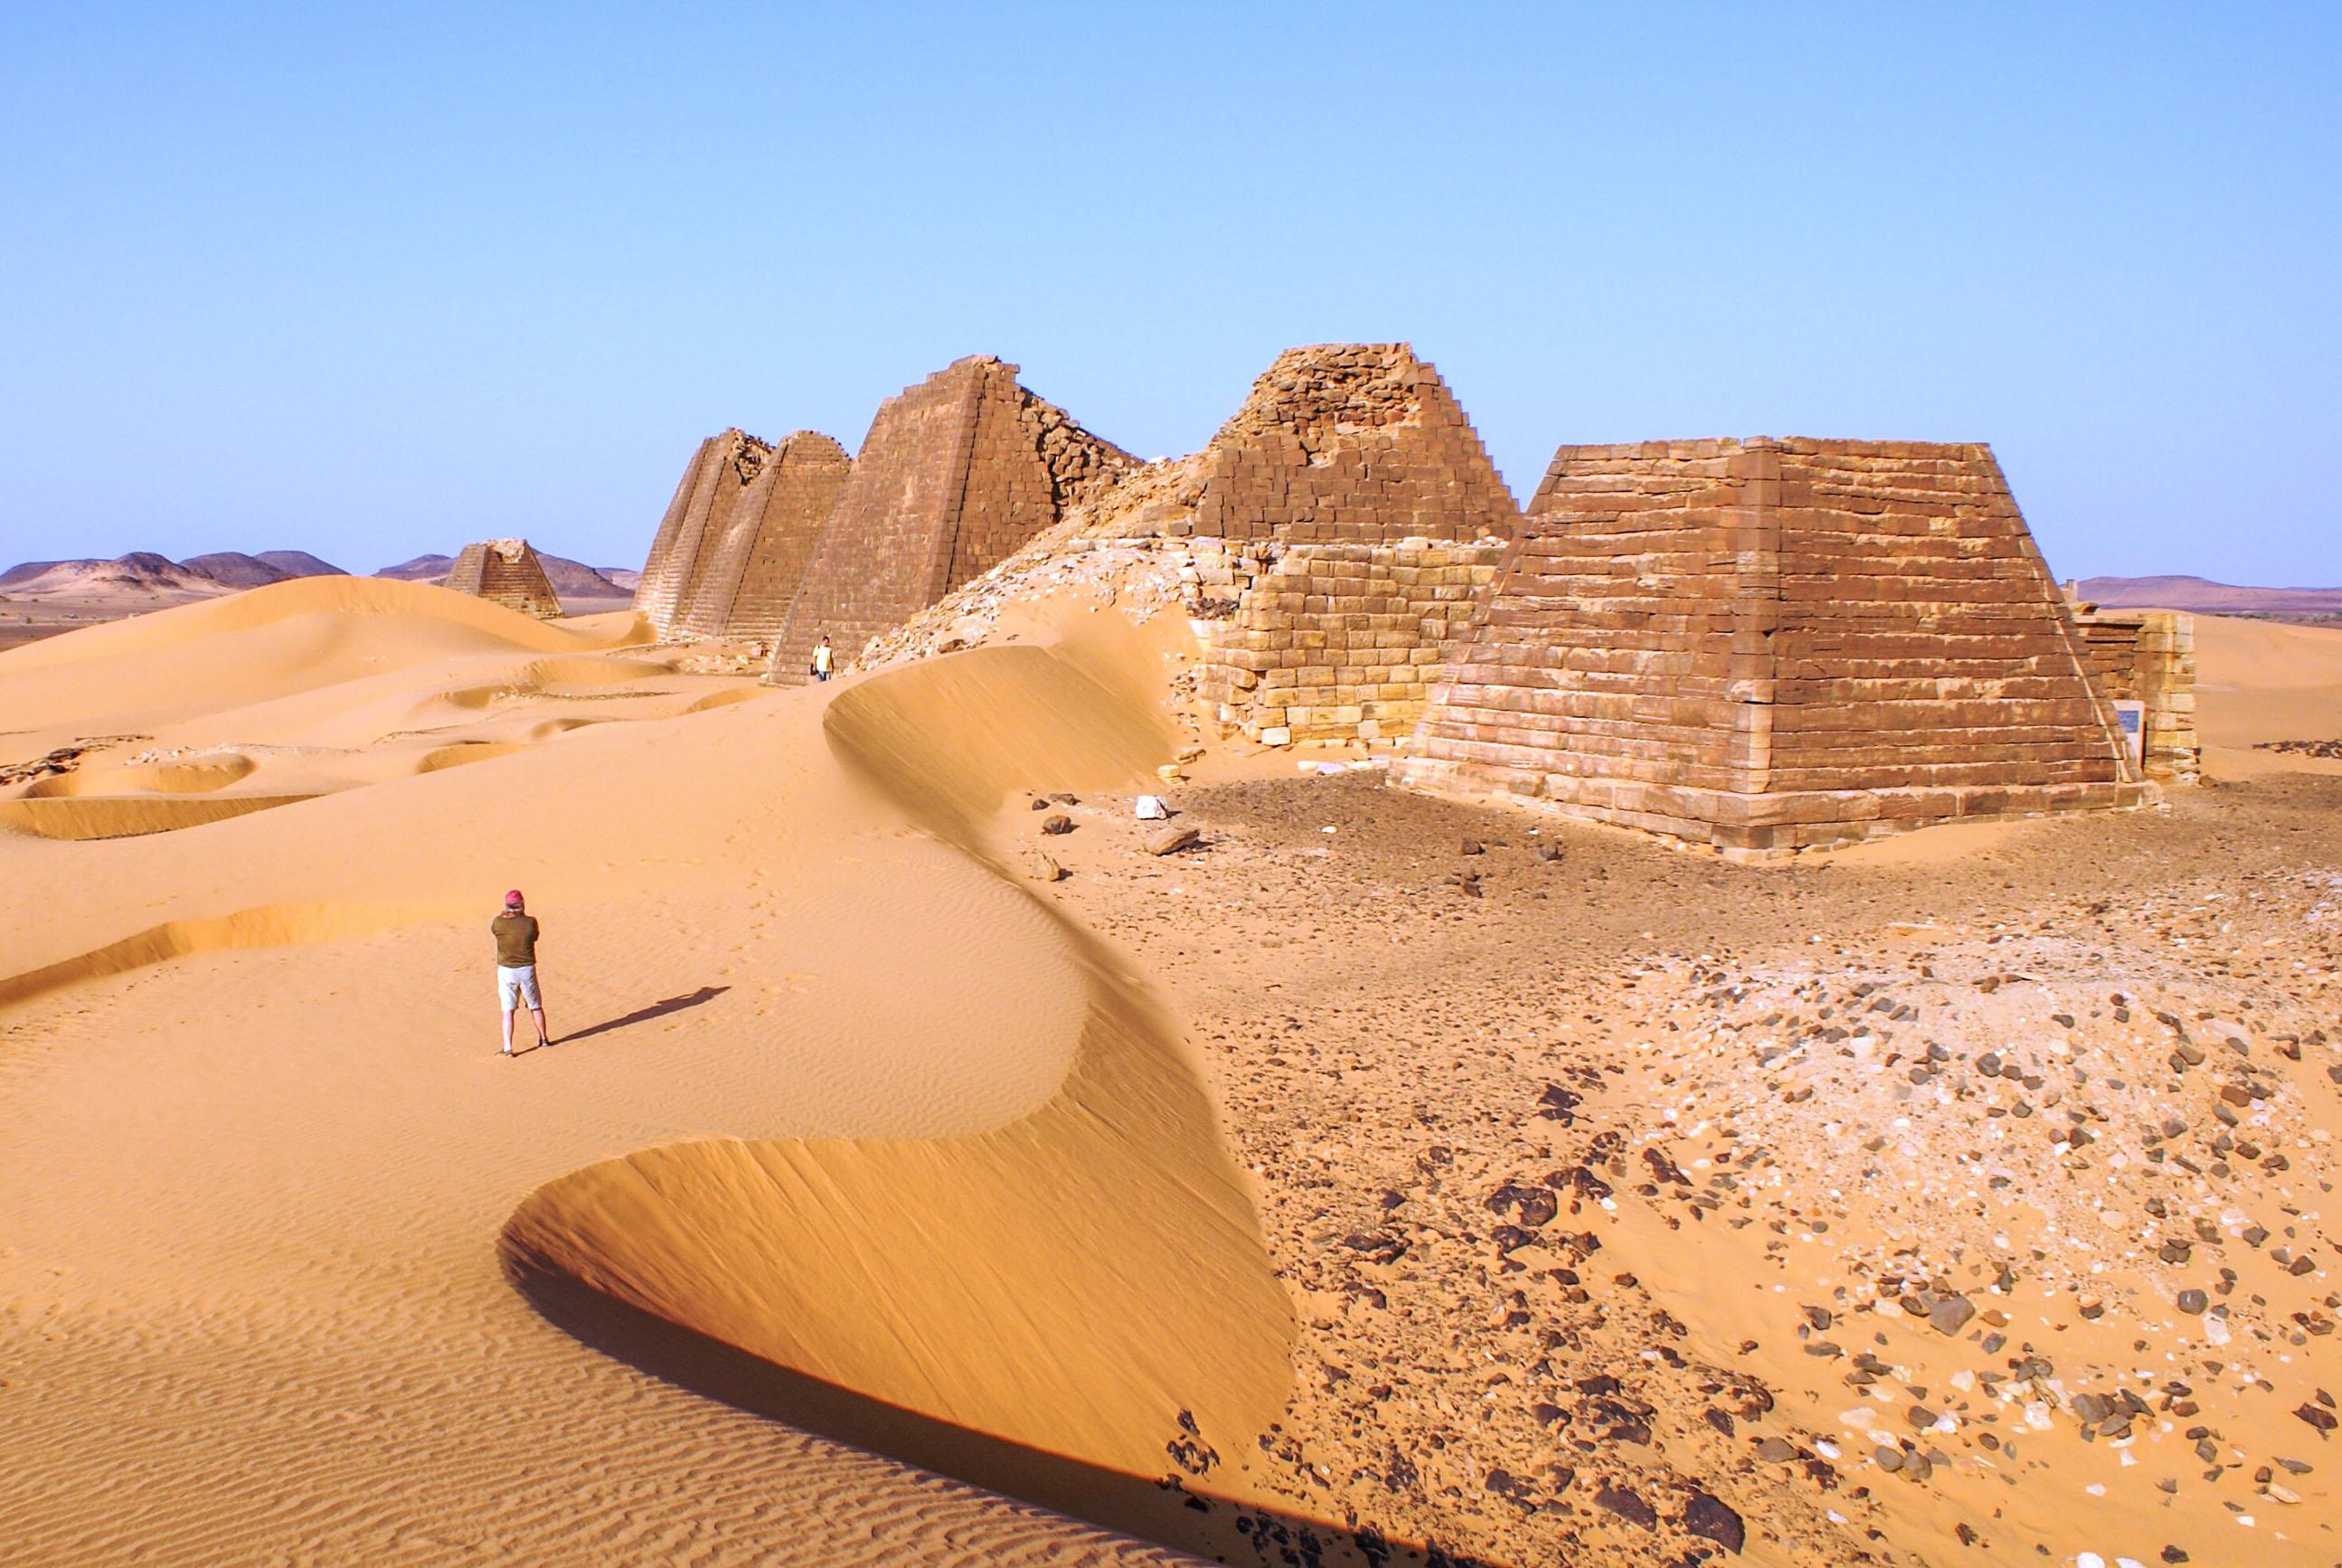 https://bubo.sk/uploads/galleries/17820/lubosfellner_sudan_5-mweroe-uplne-smay-nadhera-spali-sme-medzi-pyramidami.jpg